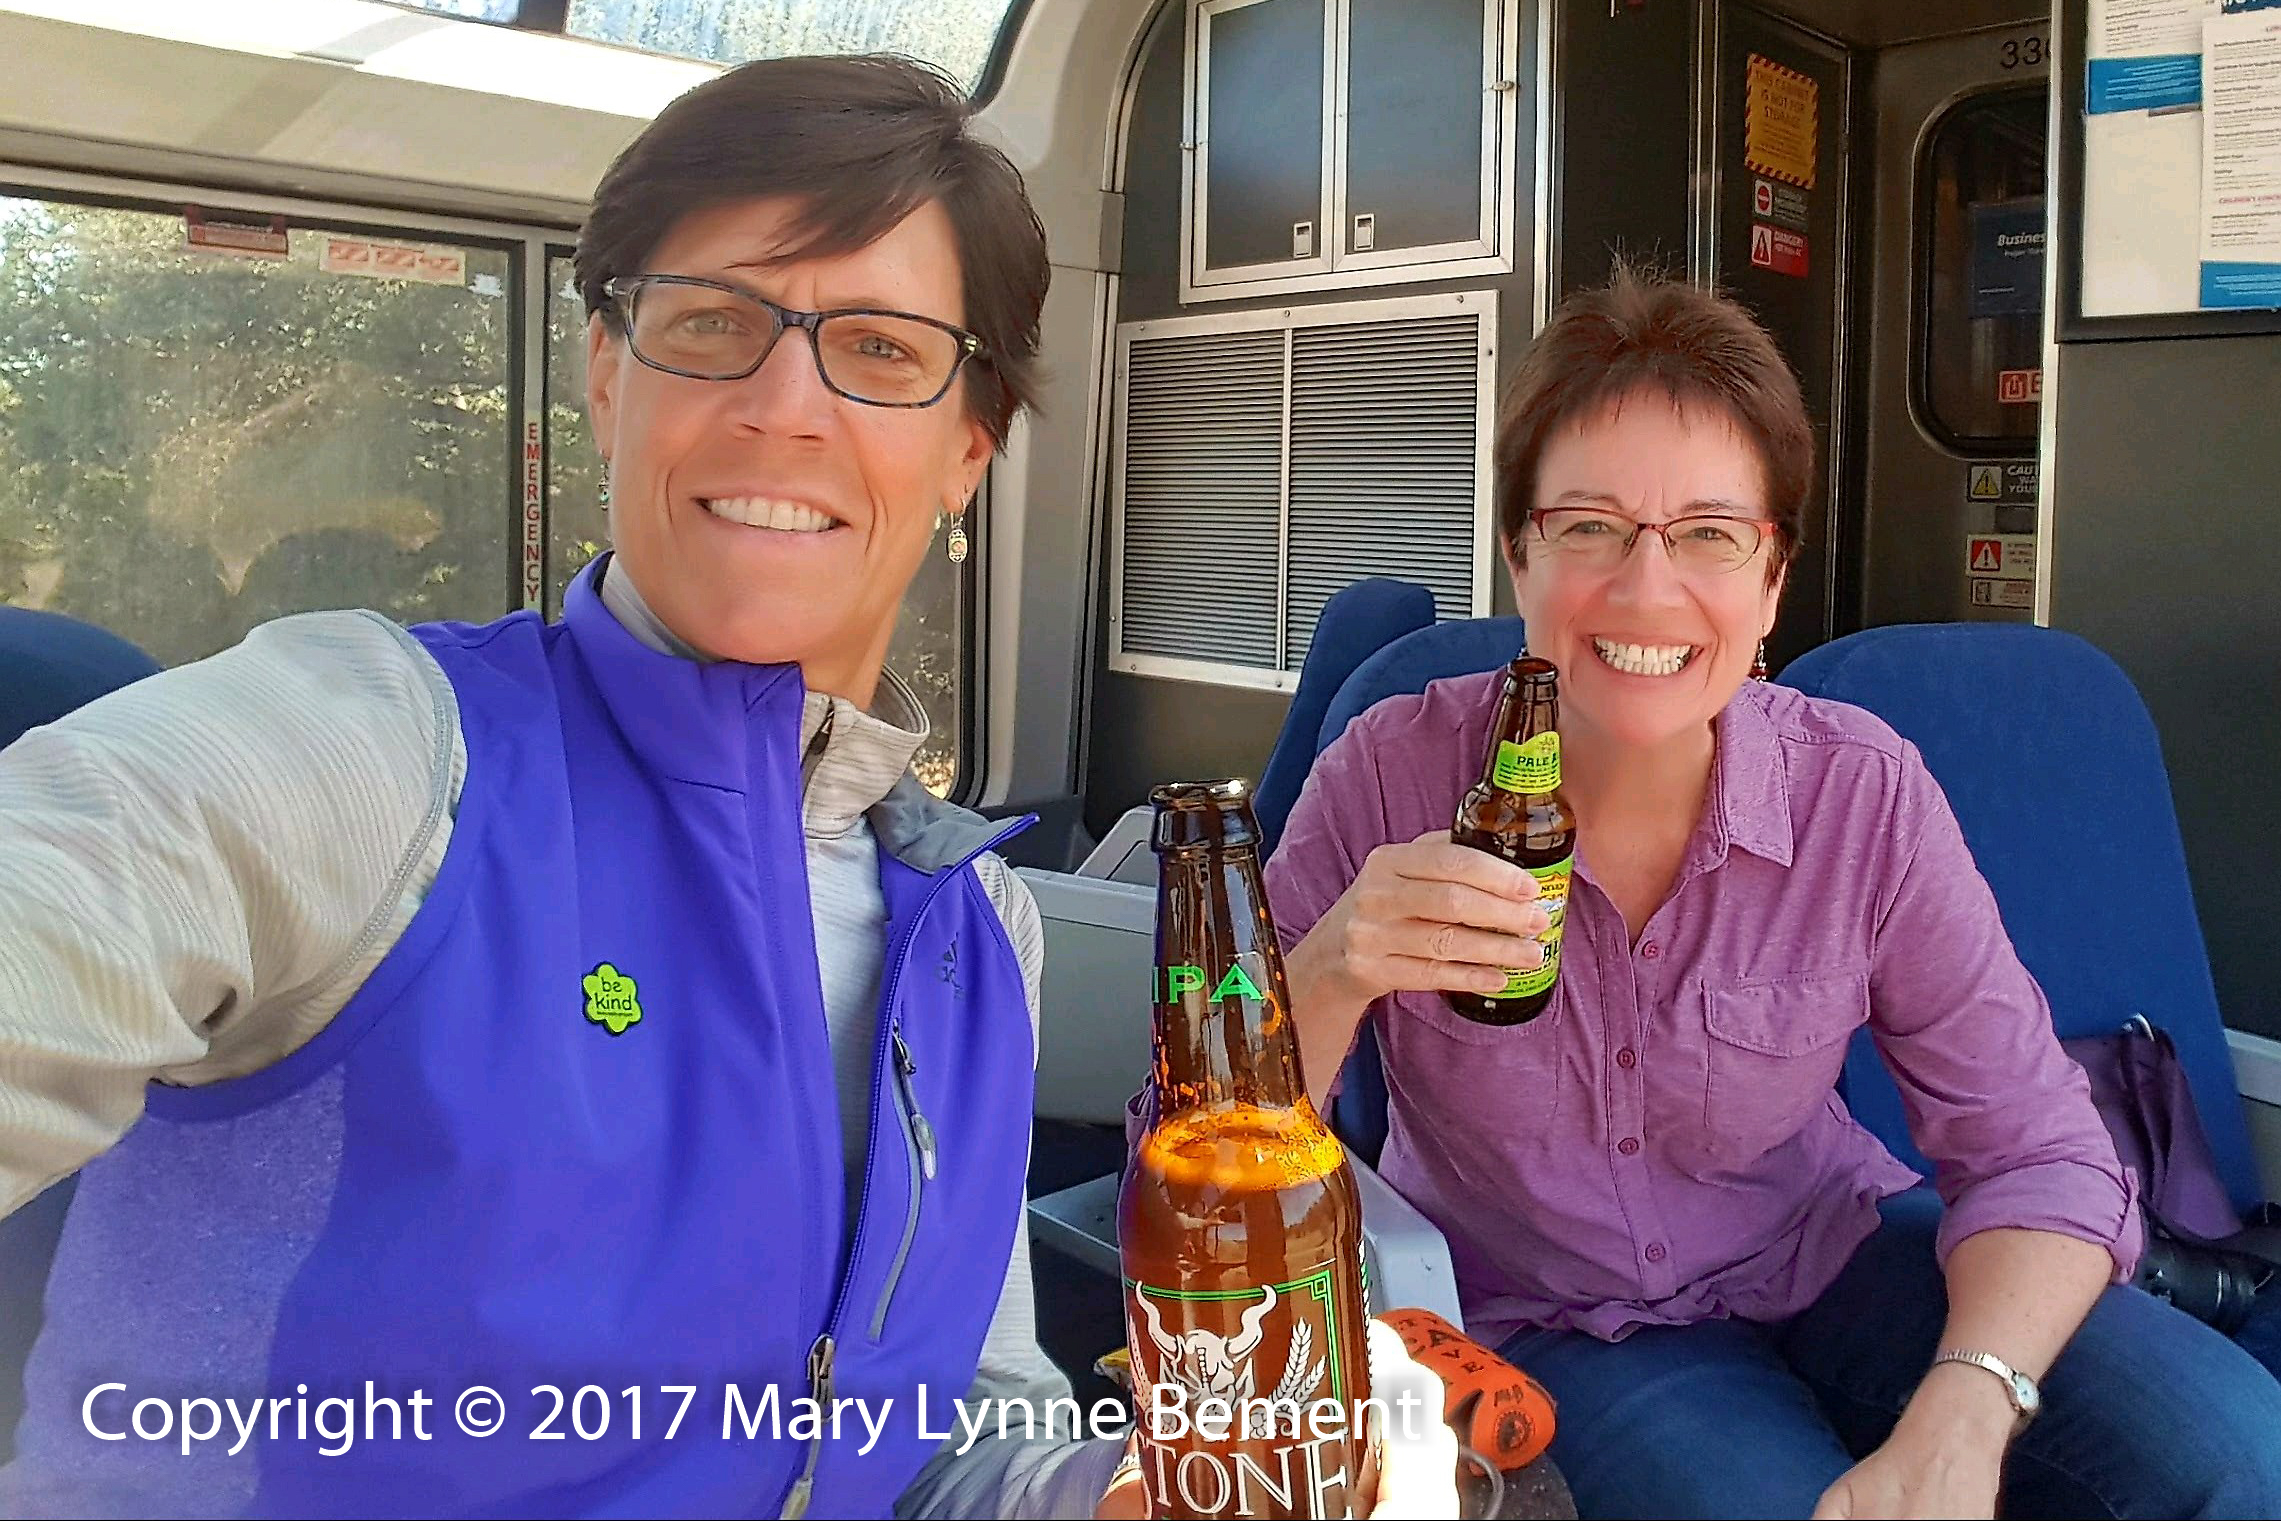 020_Coast Starlight train trip, September 2017_Parlour Car_ML, Paula